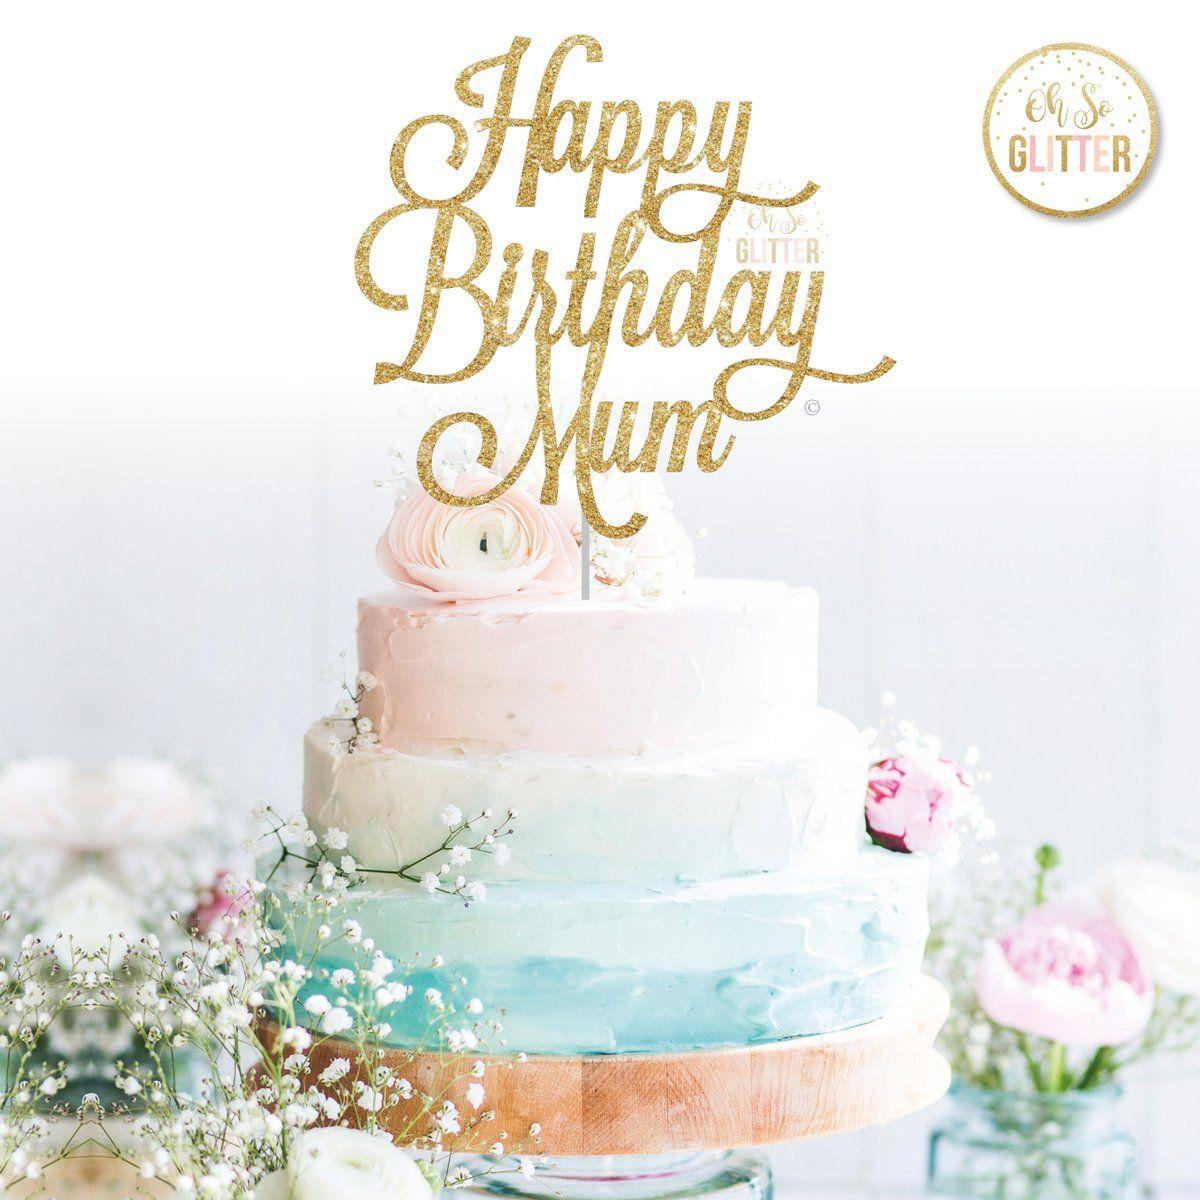 Happy Birthday Mum Cake Topper